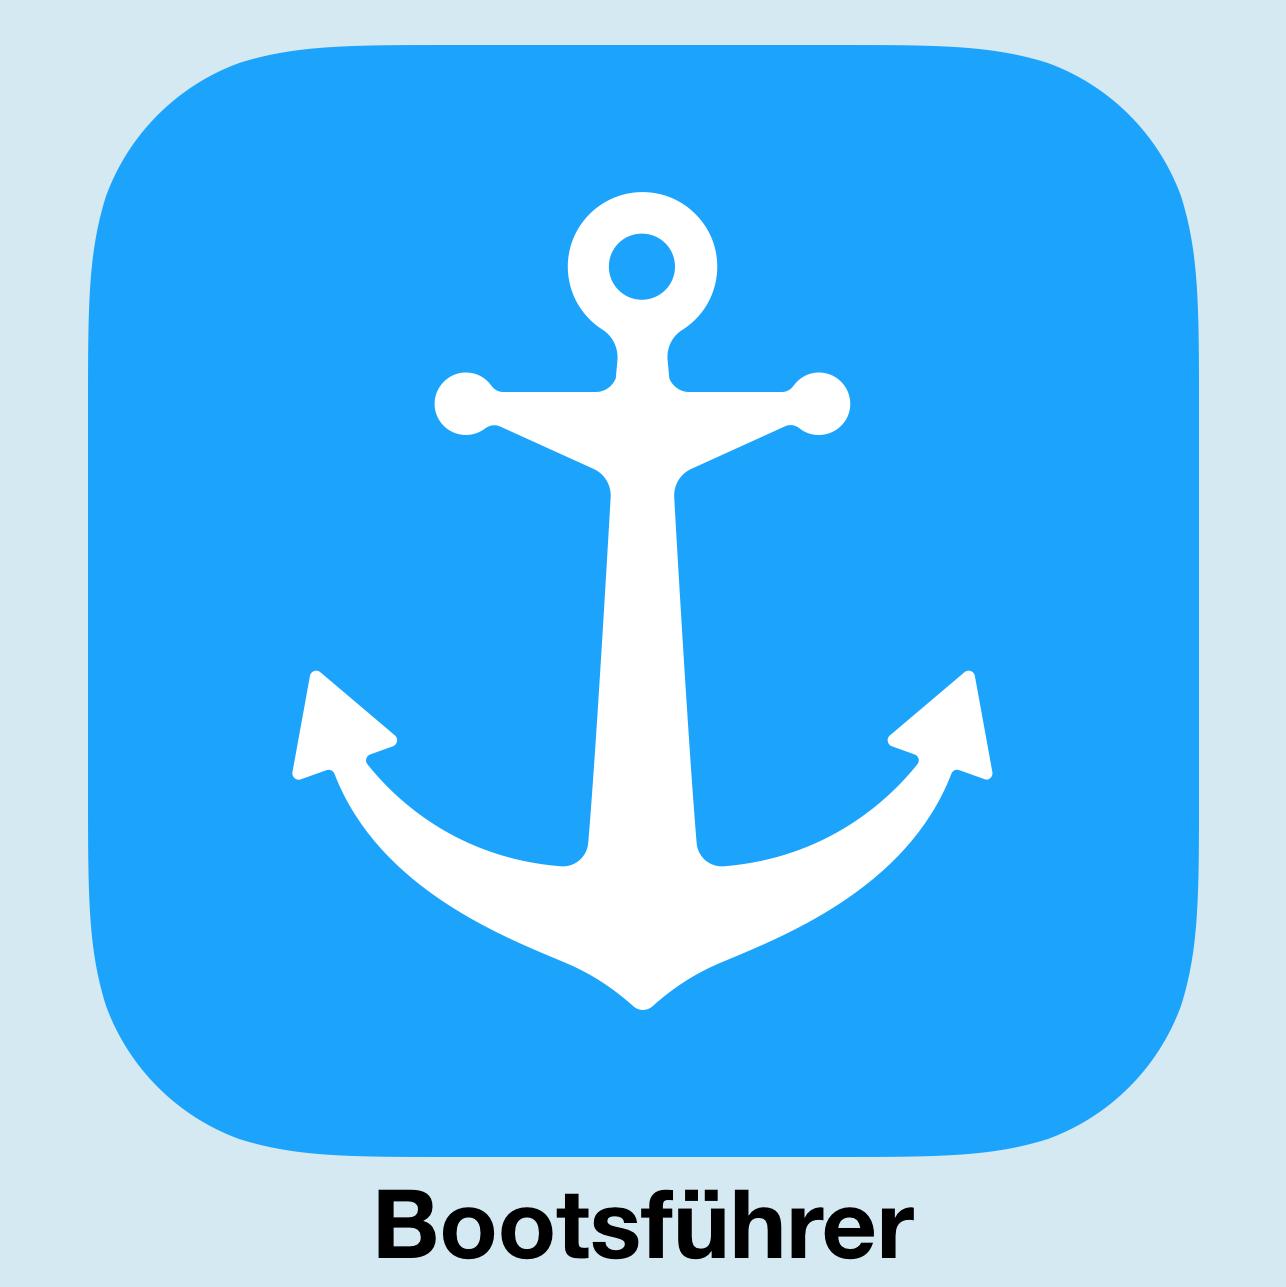 Bootsführer